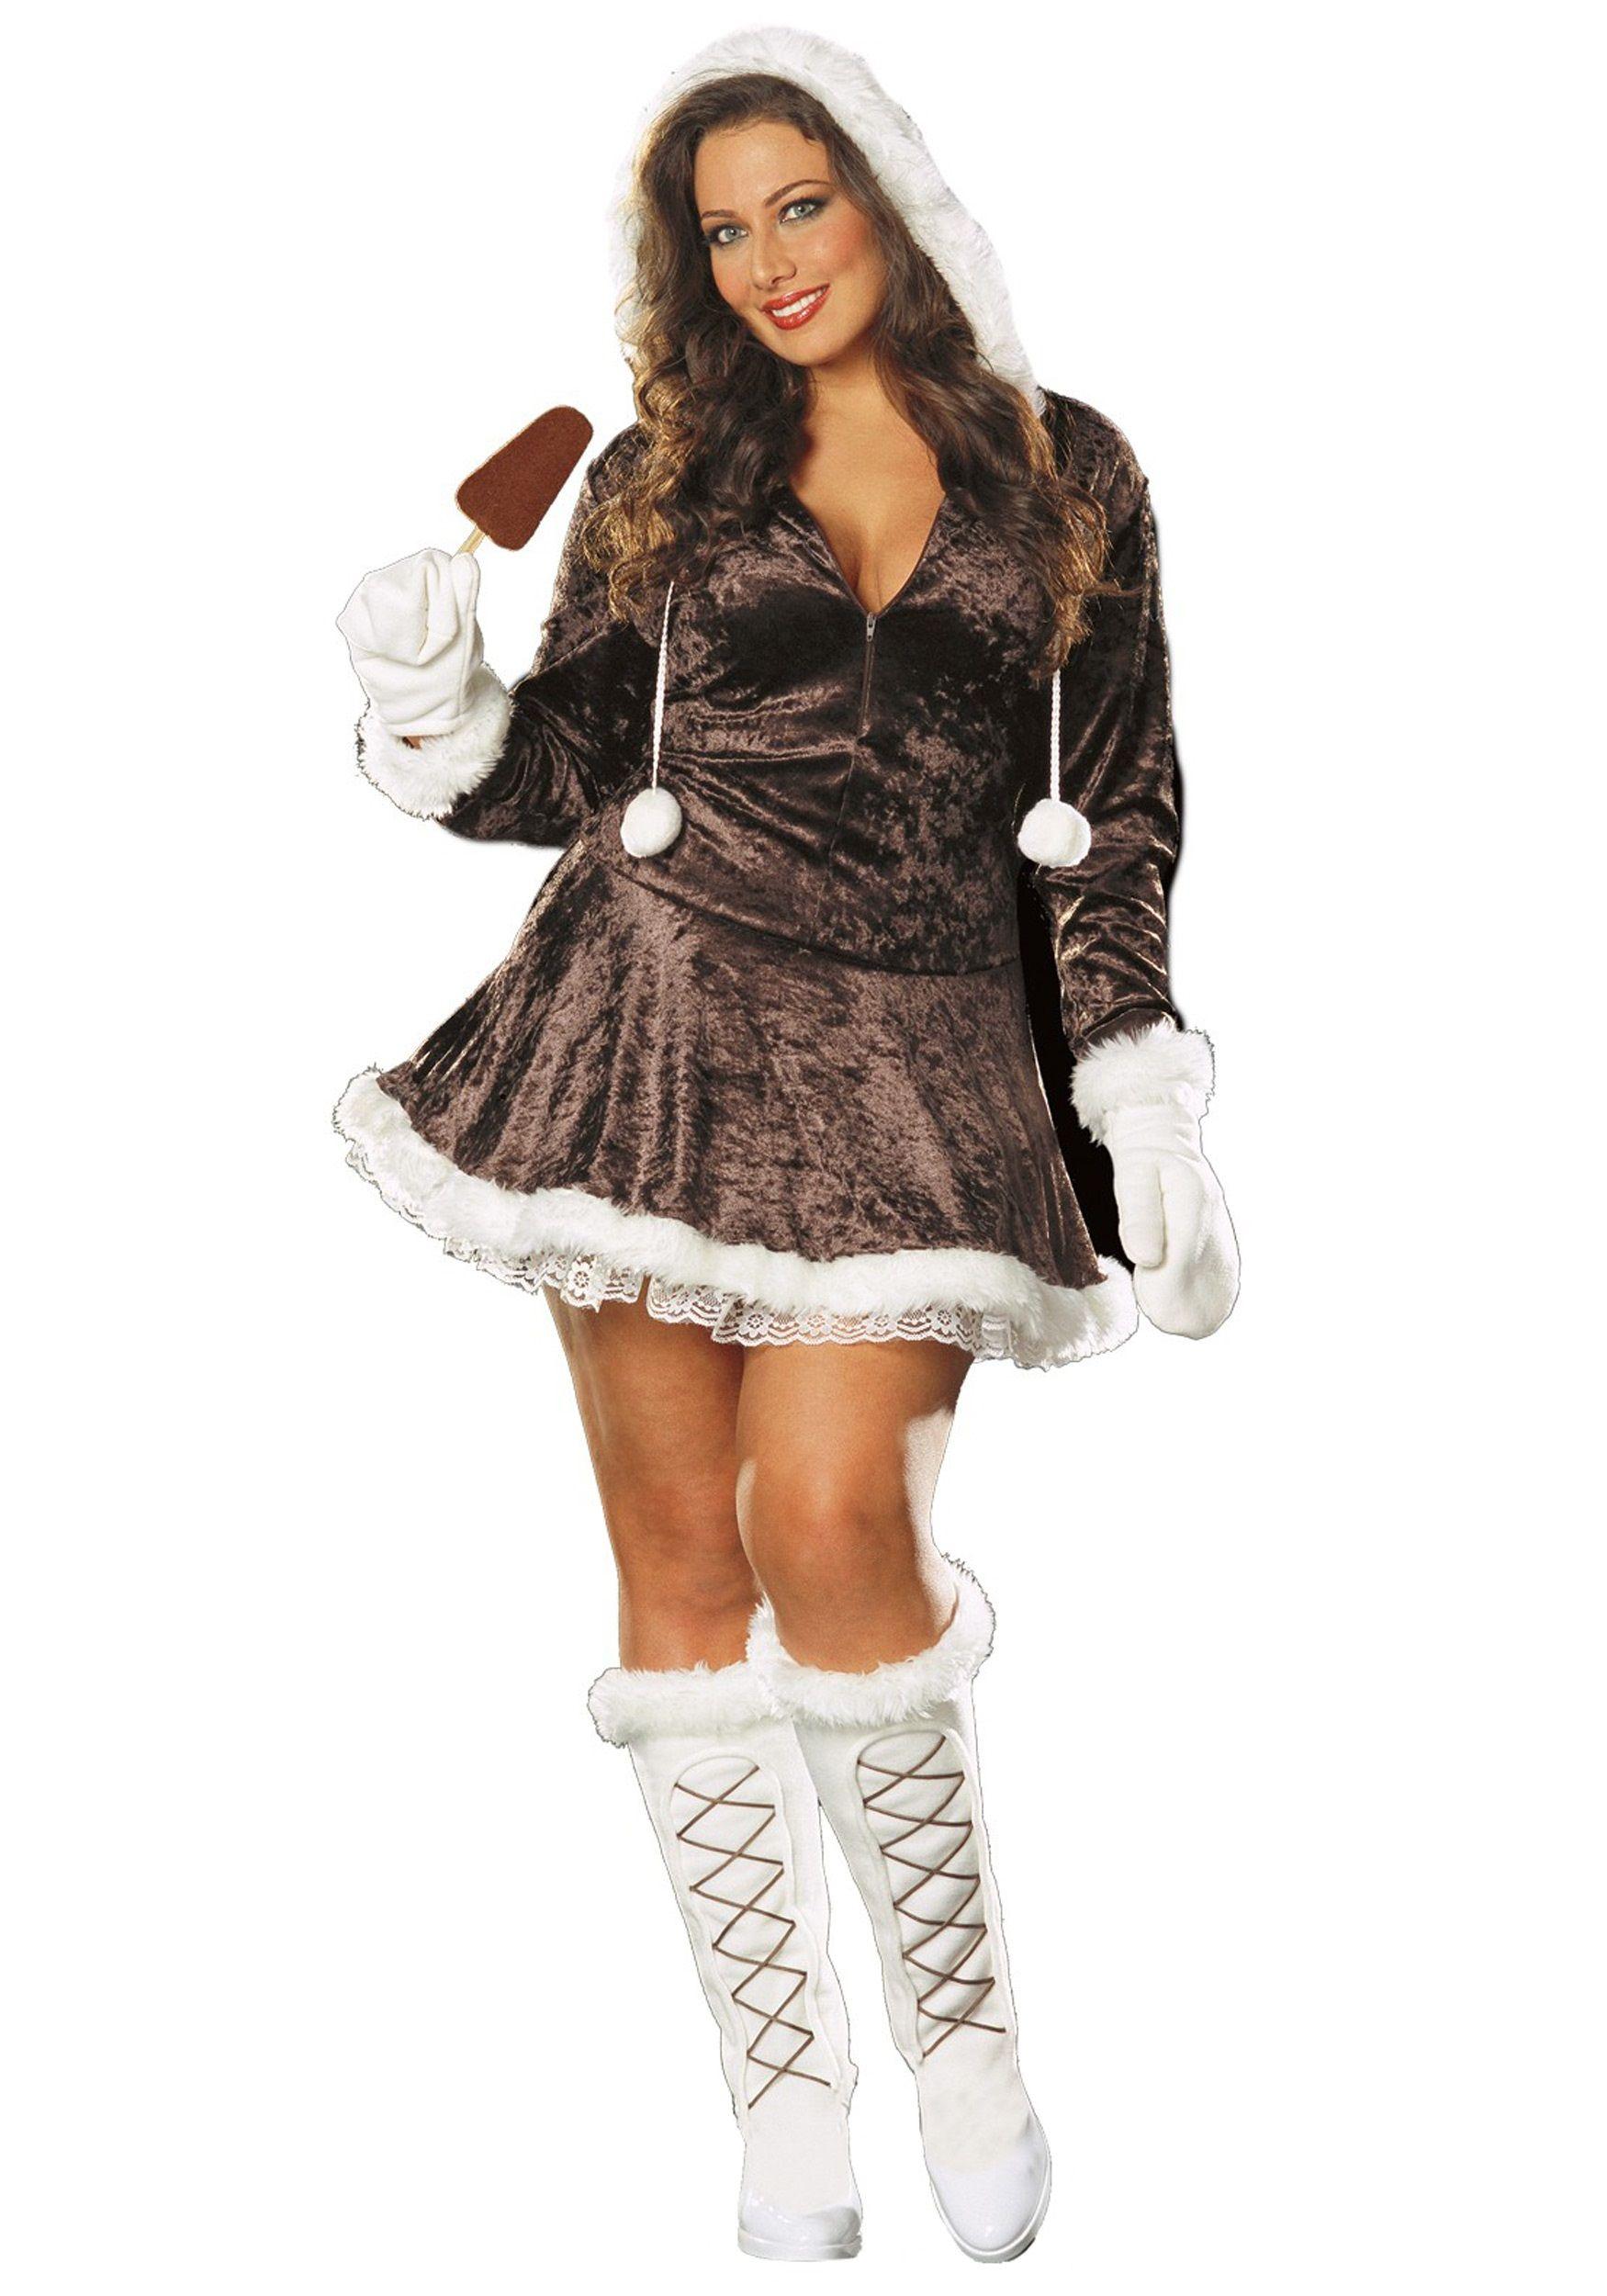 Plus Size Costumes Mens, Womens Plus Size Halloween